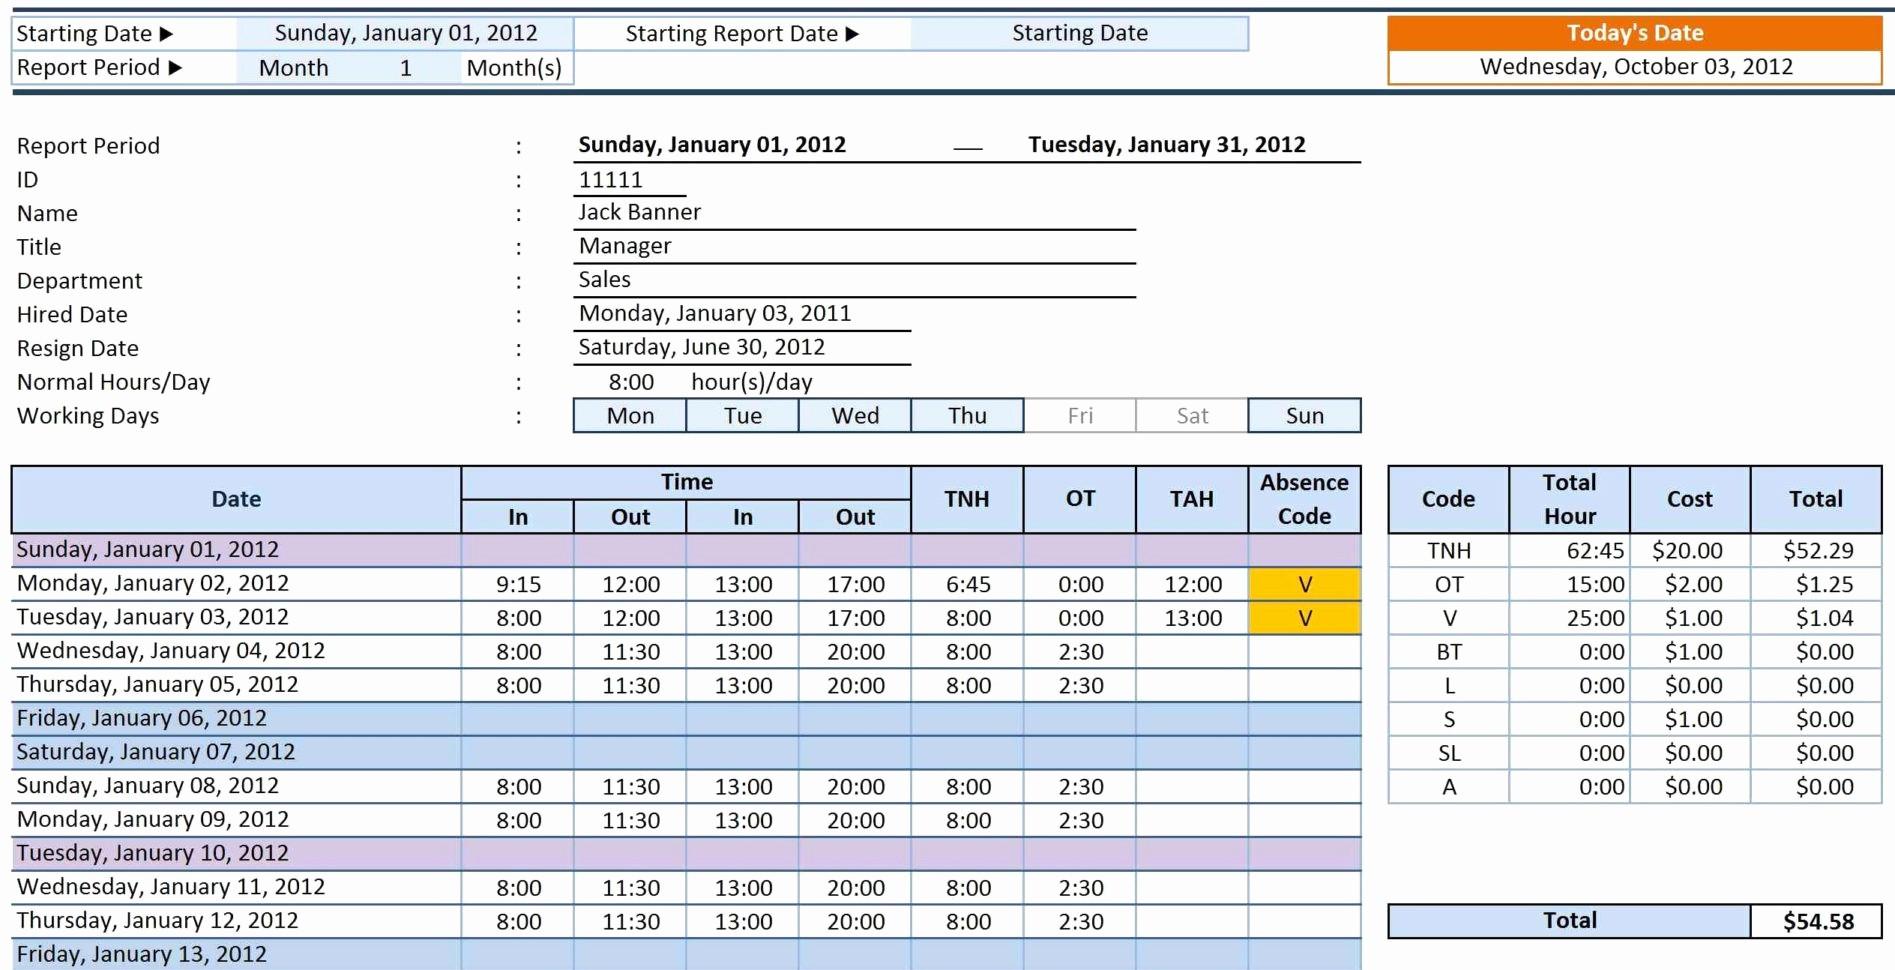 Schedule C Expense Excel Template Luxury Self Employed Expenses Spreadsheet Elegant Self Employed